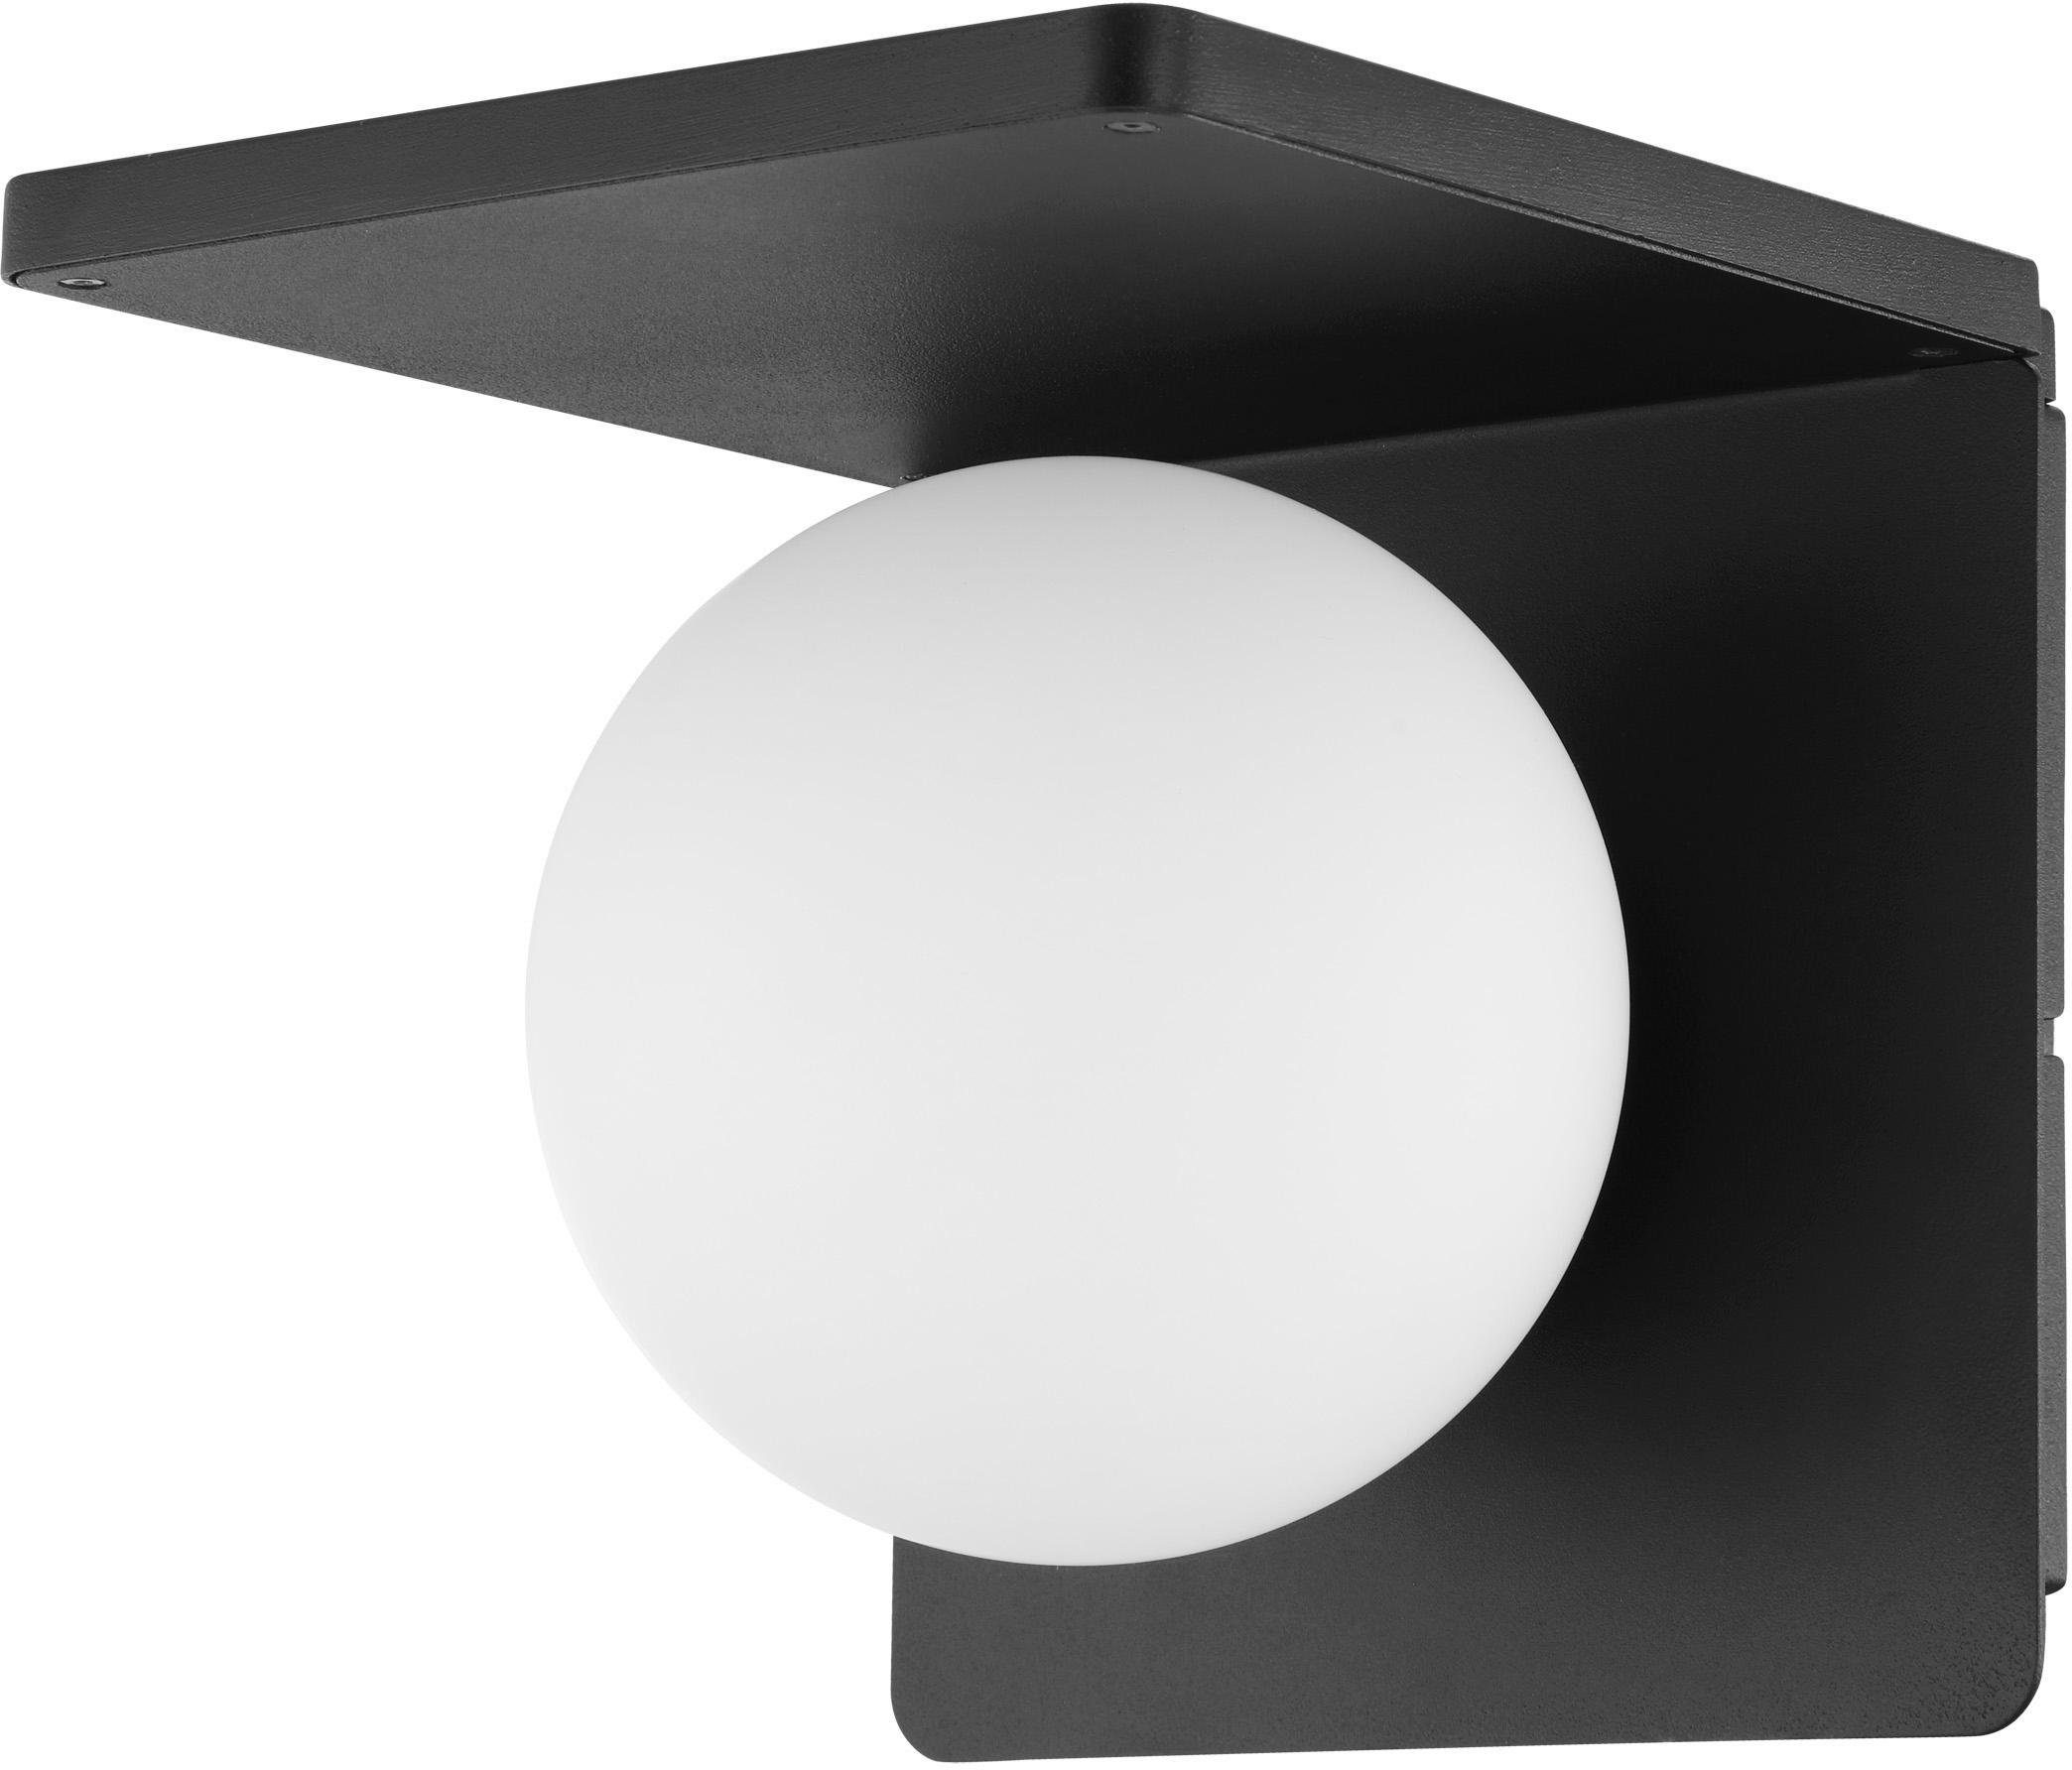 46 x 11 x 11 cm EGLO Wandleuchte Stahl E14 Chrom//Wei/ß